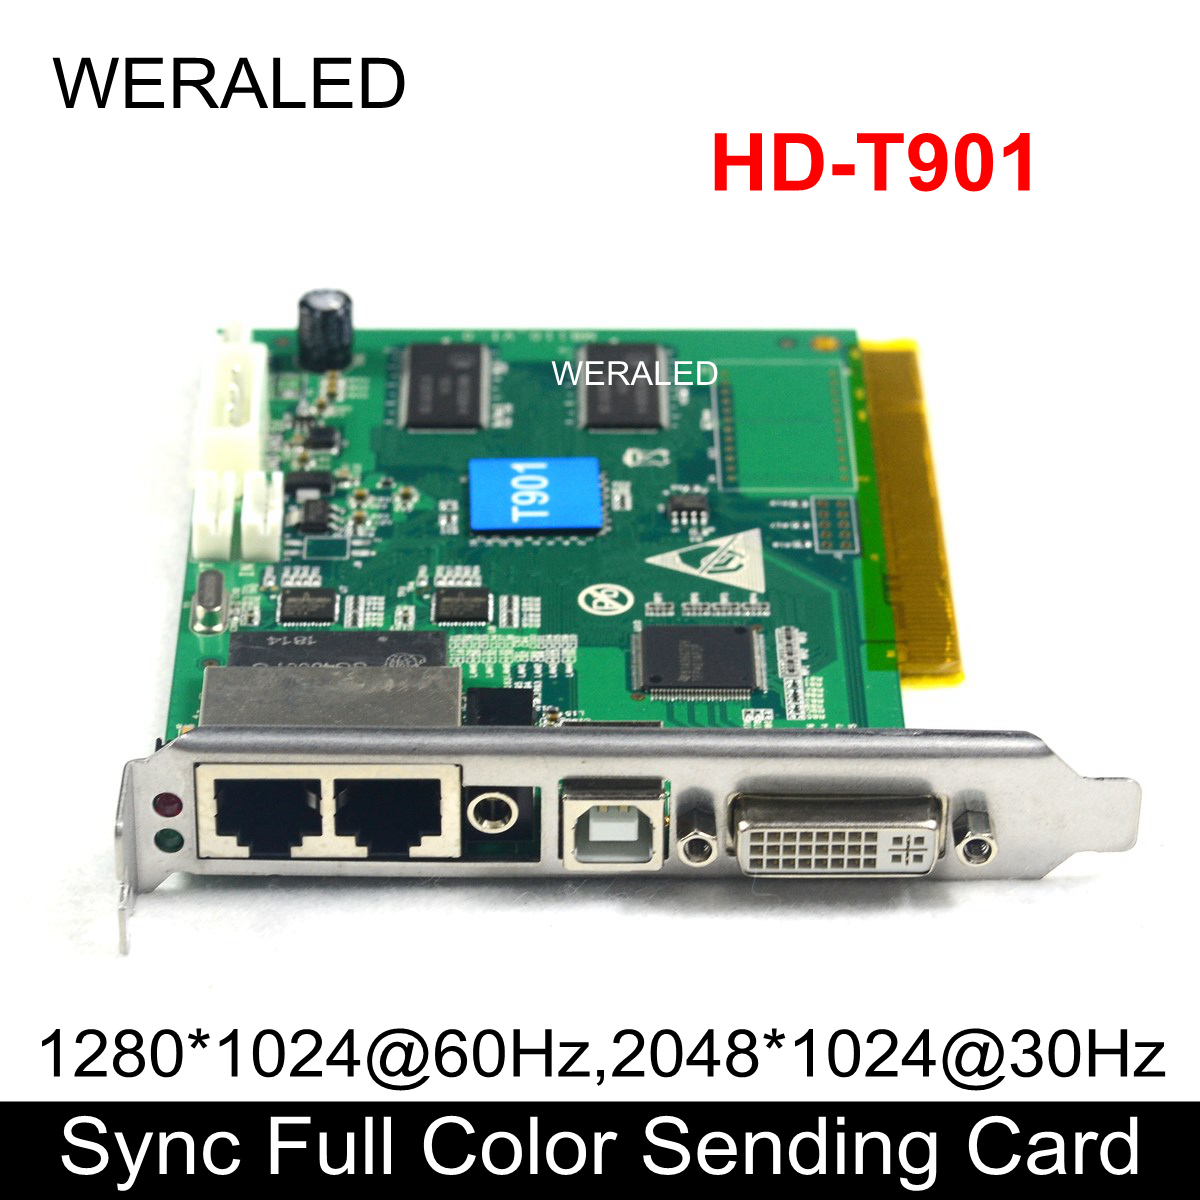 huidu hd t901 synchronous full color cartao de envio rgb levou controlador de video suporte p2